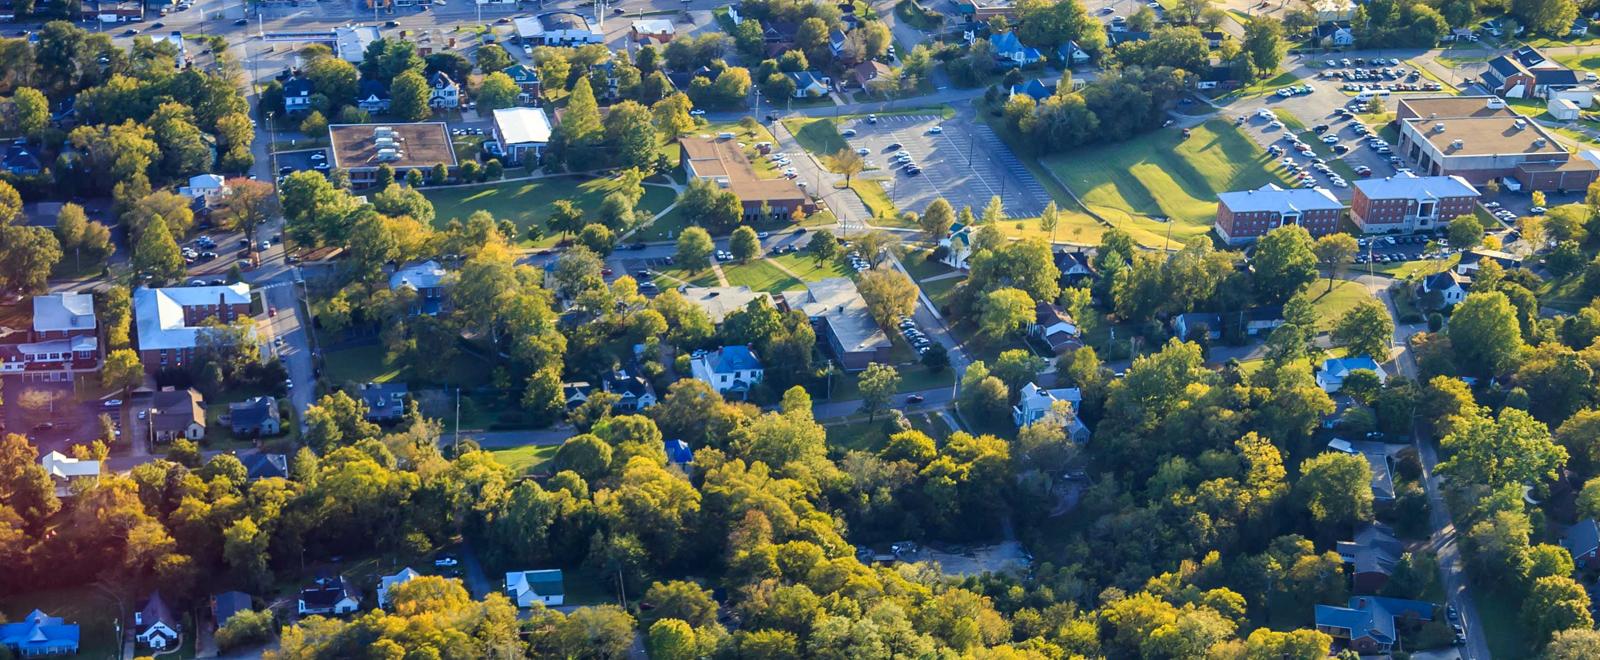 Martin Methodist Aerial View